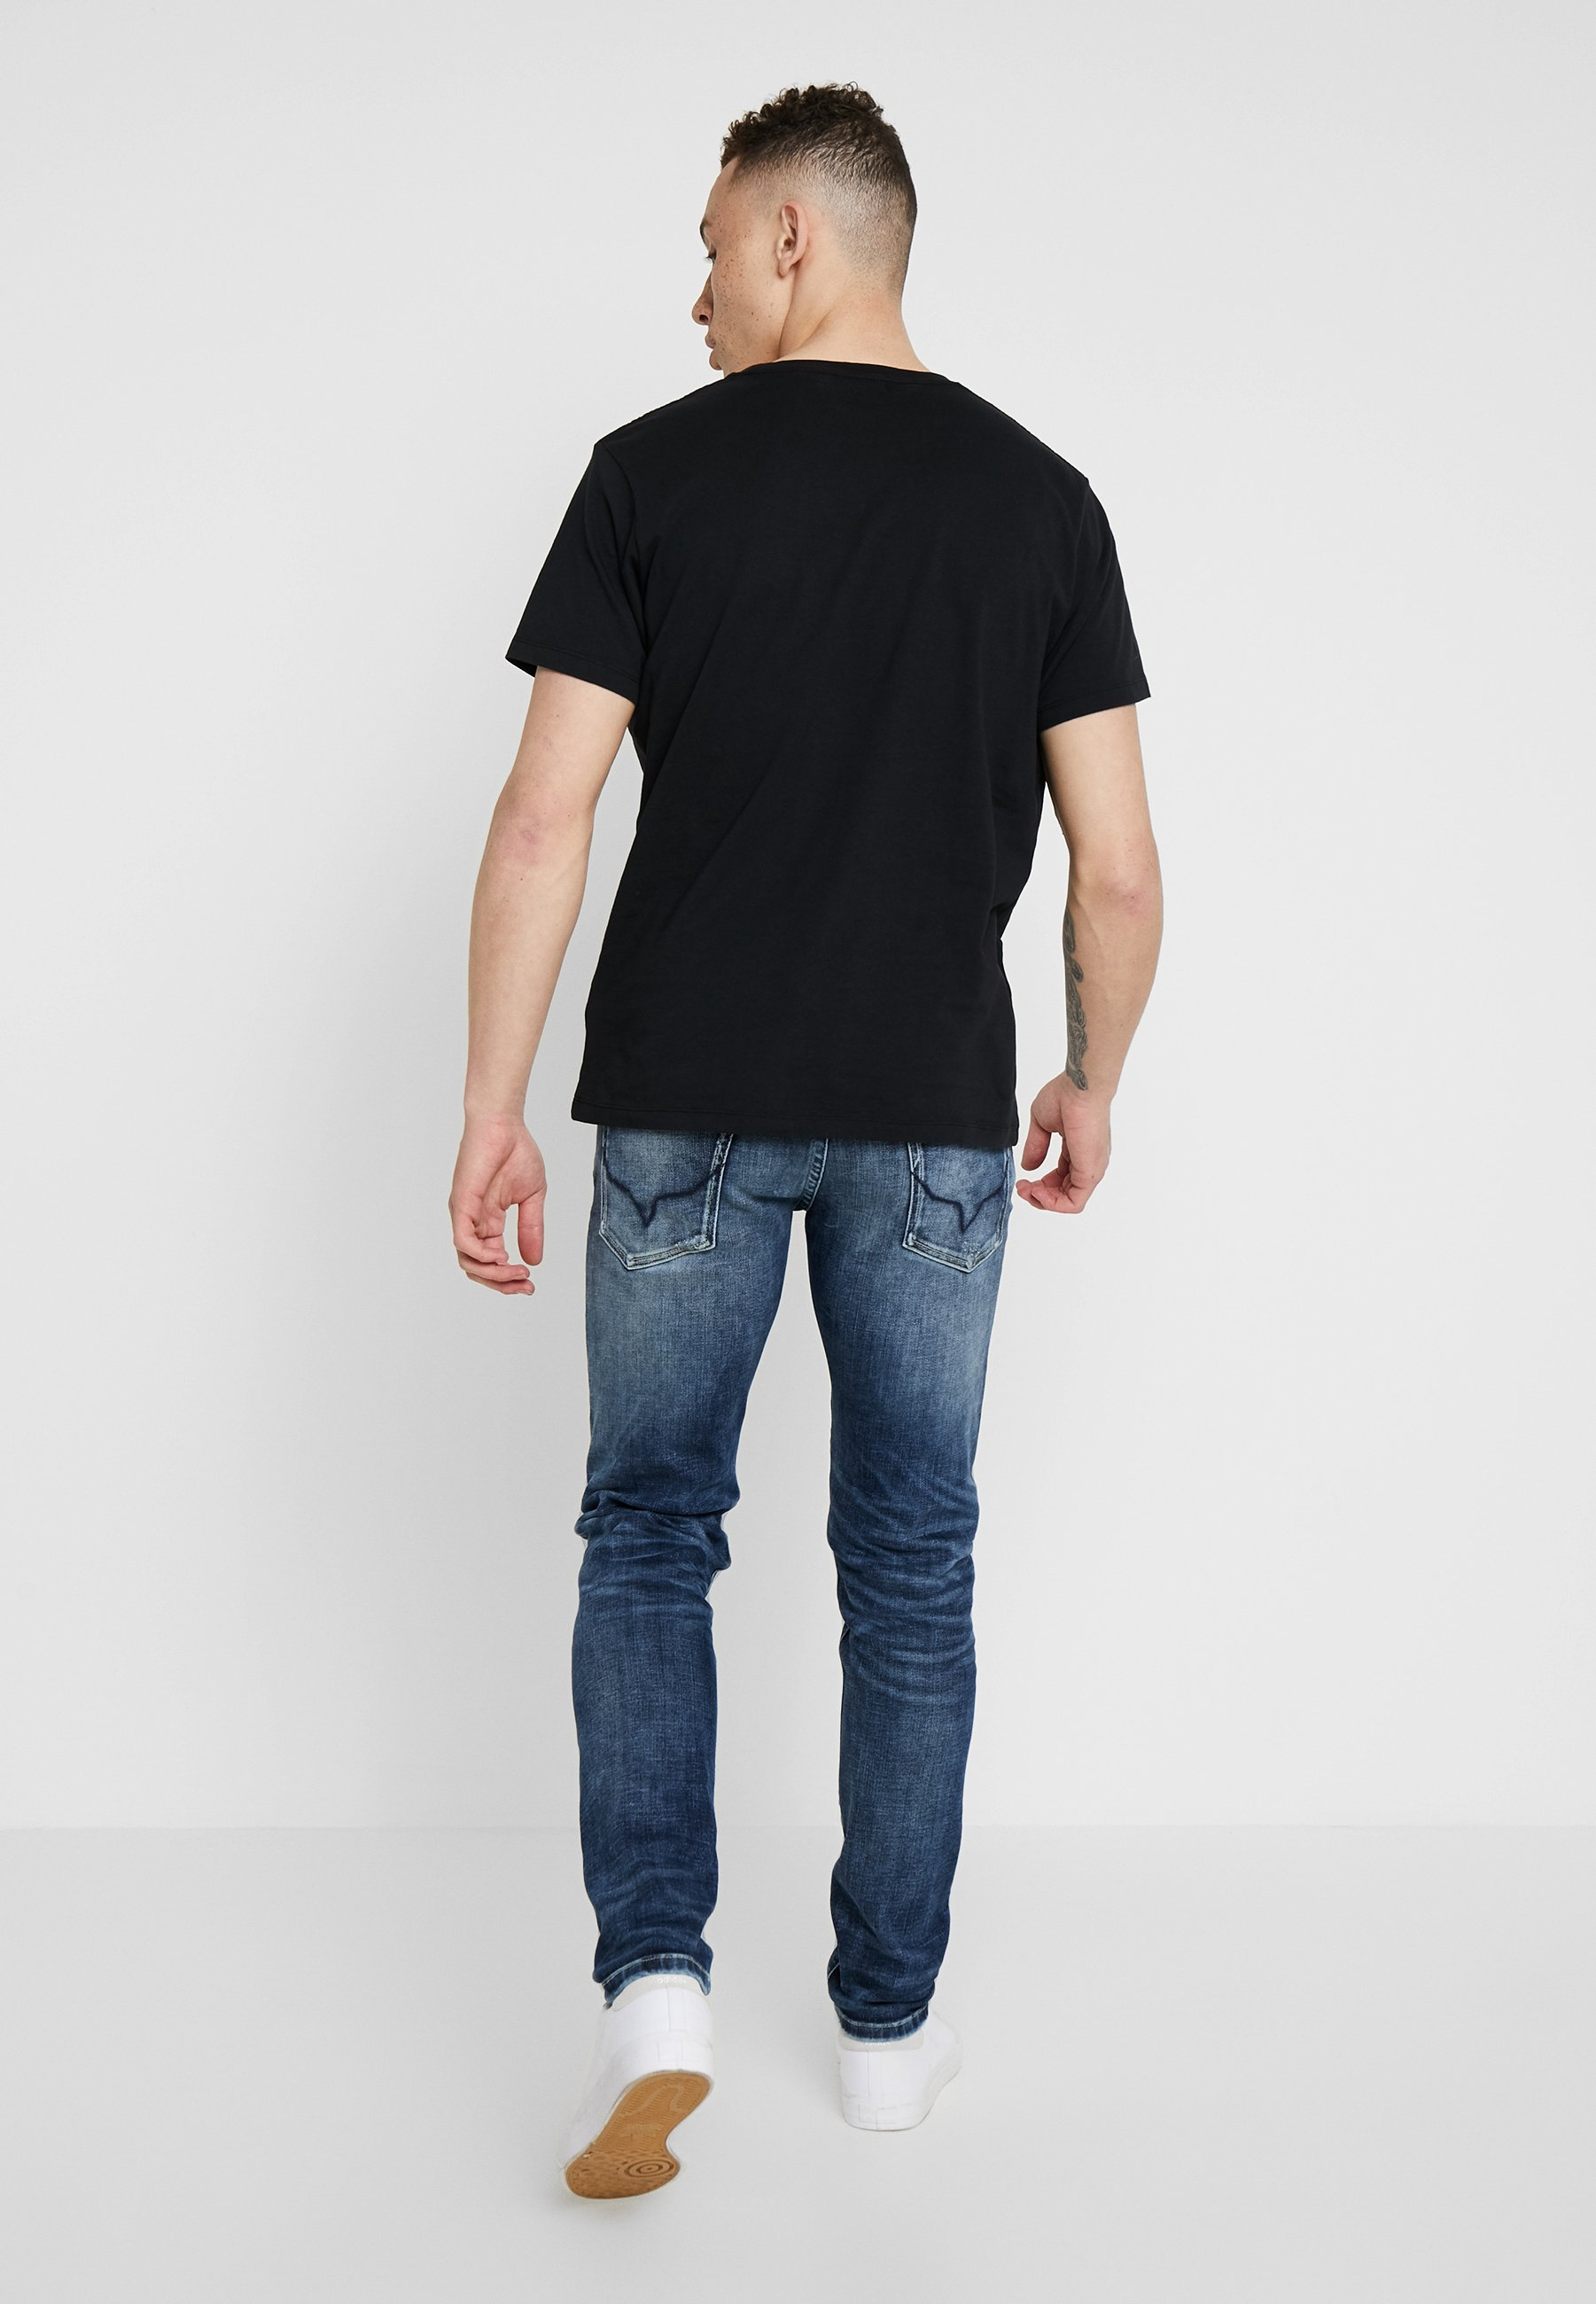 HatchSlim Dark Pepe Fit Used Jeans Nny0vOm8w